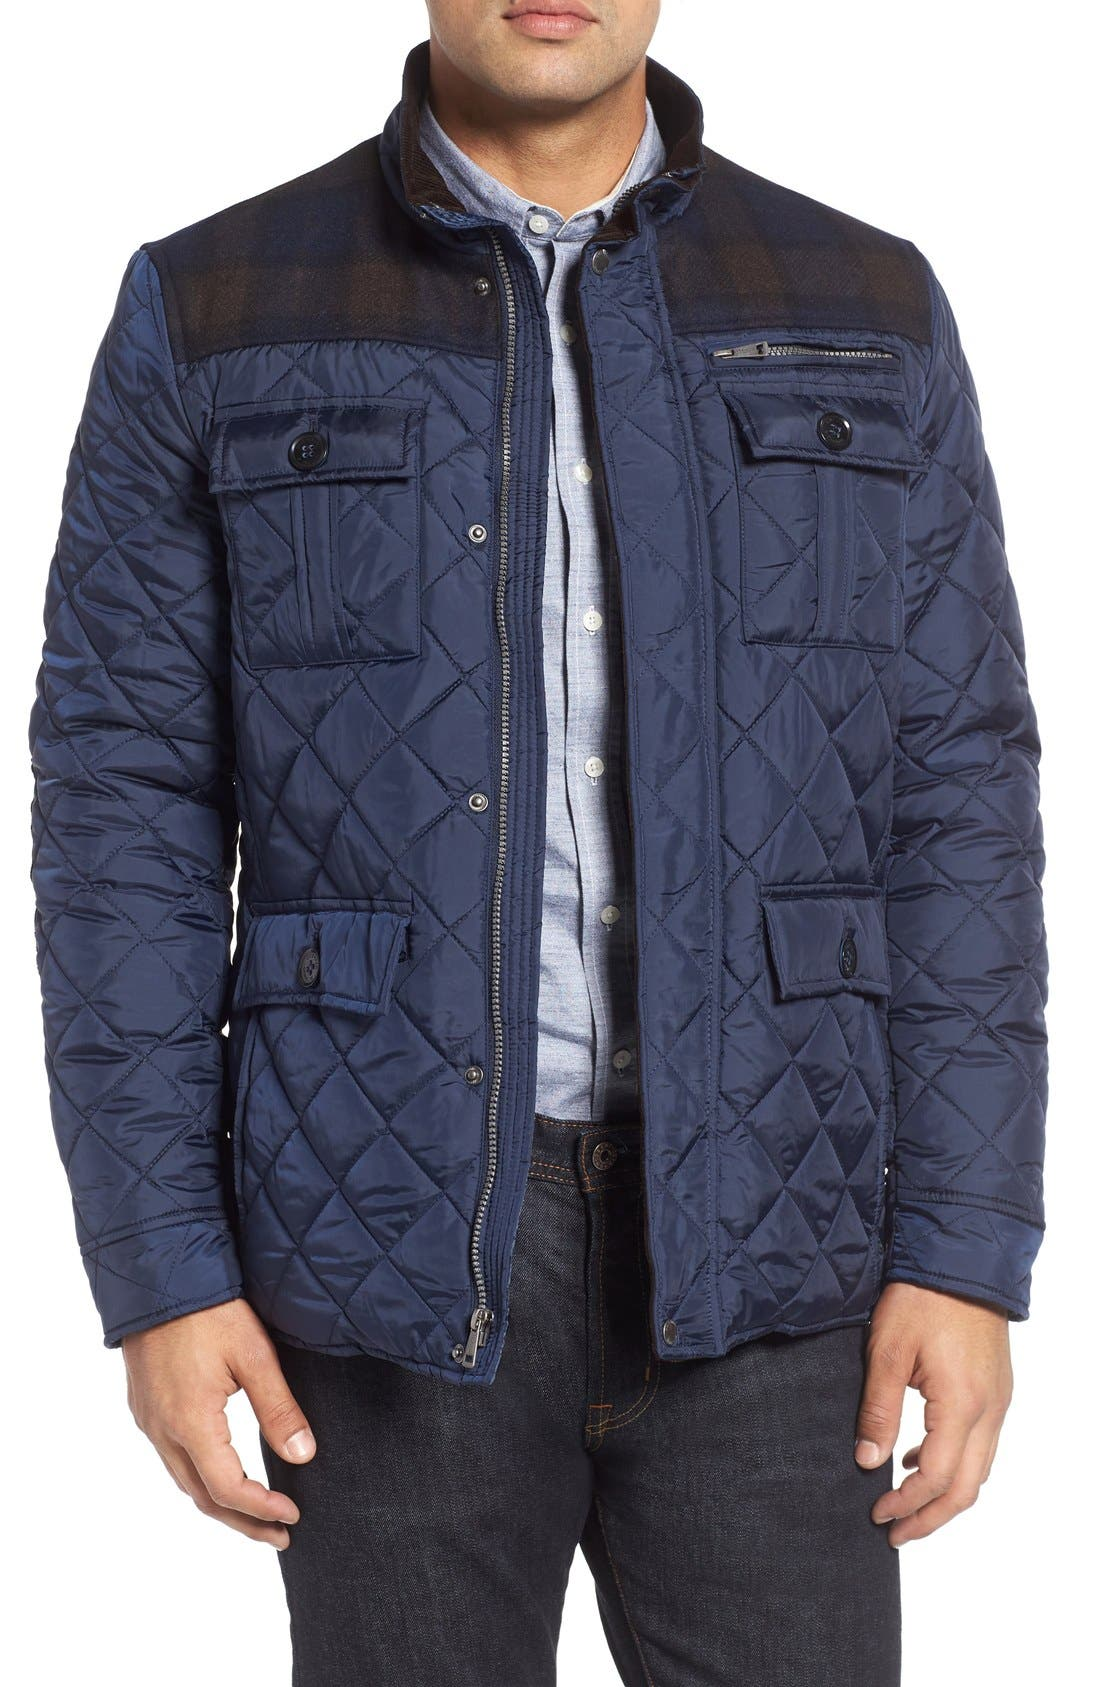 adidas Mens Class Colorblock Jacket – Indigo Blue